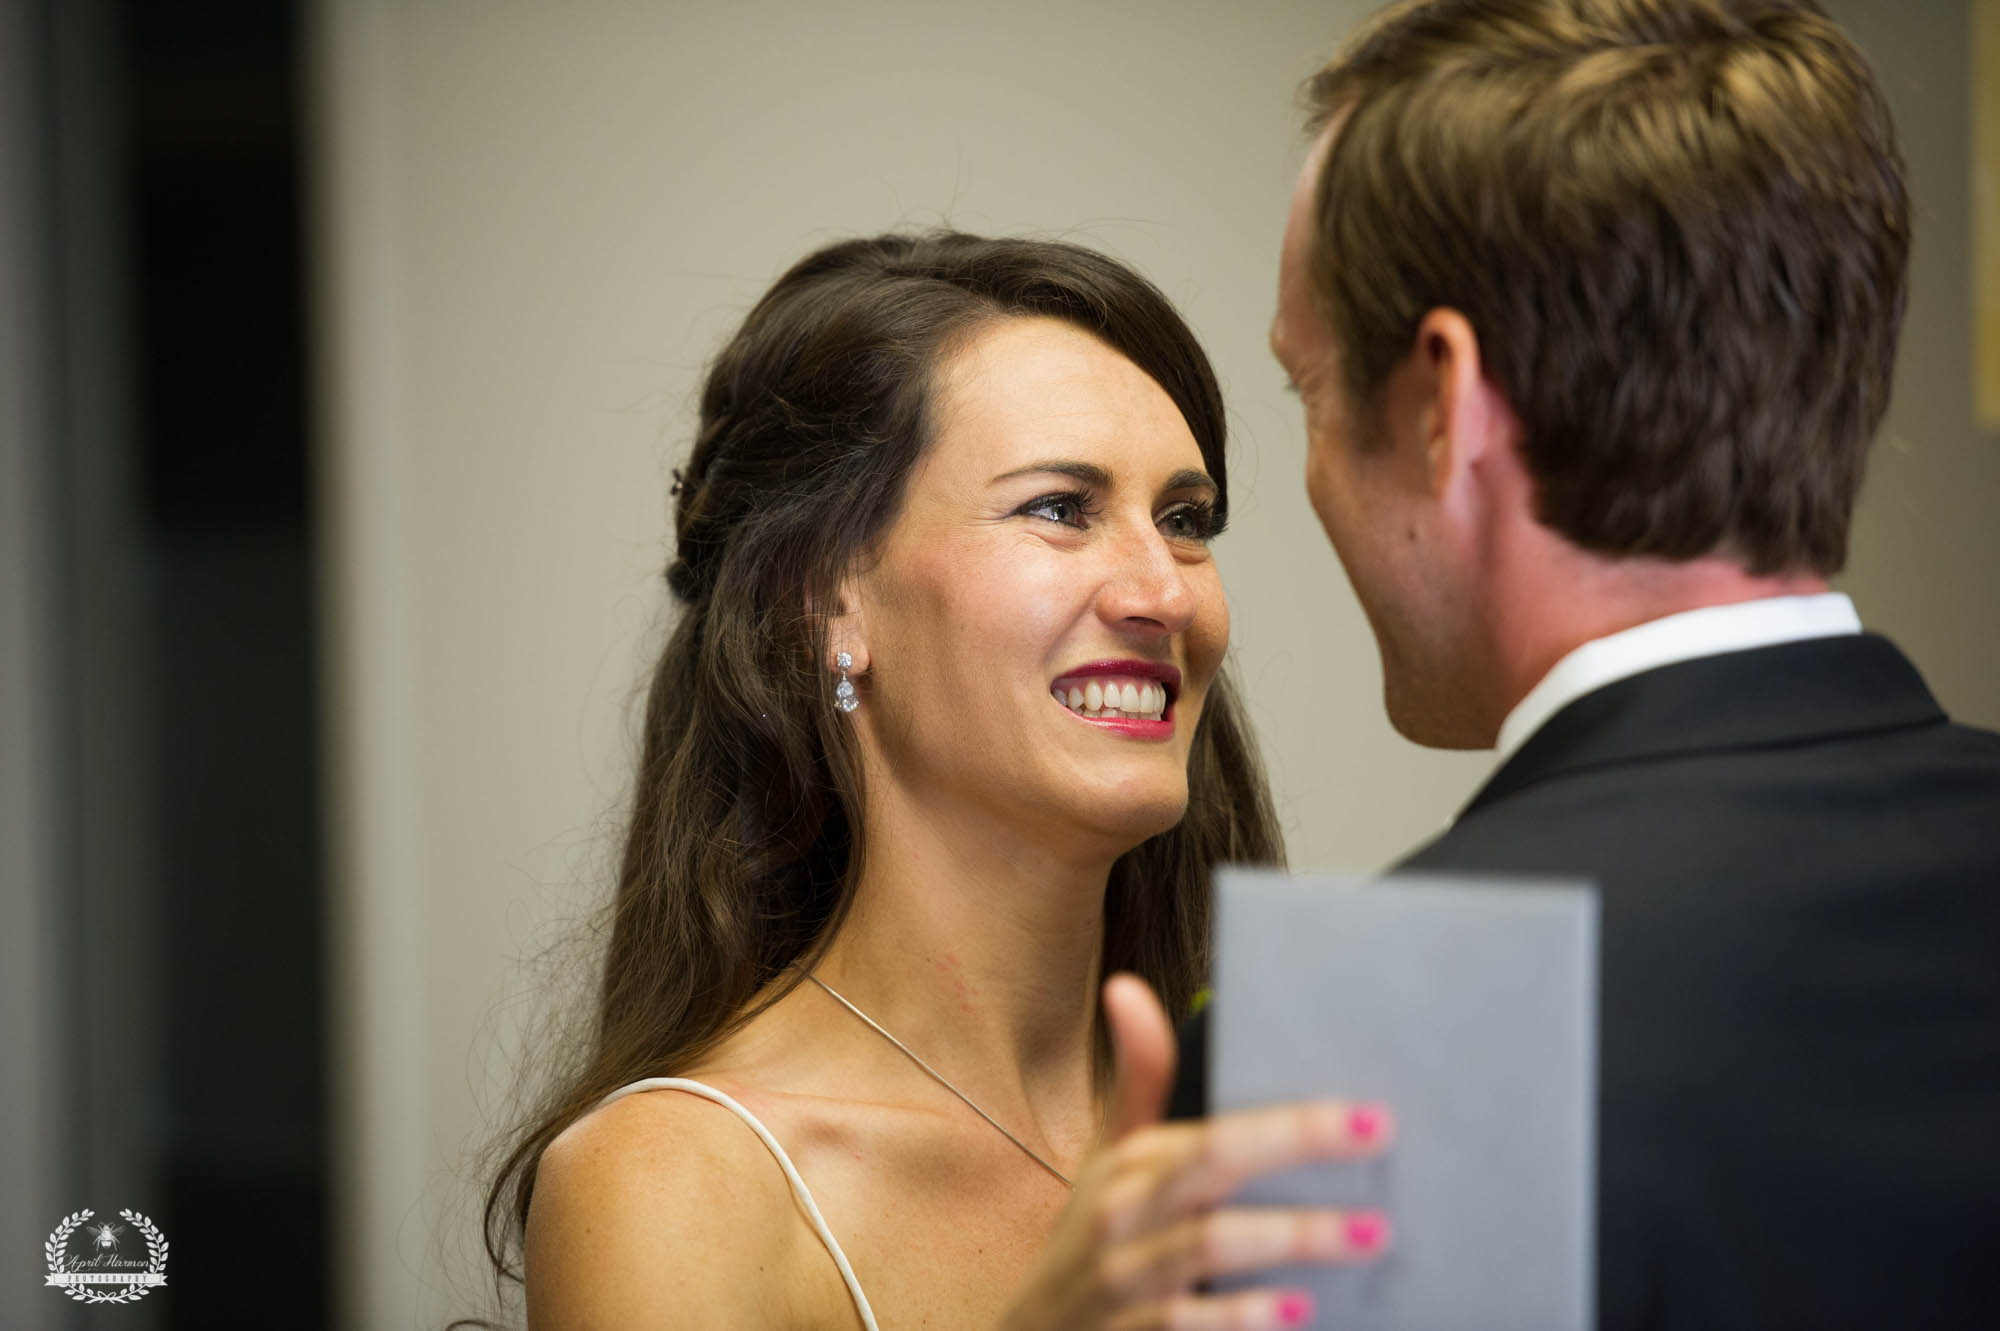 kansas-wedding-photographer9.jpg